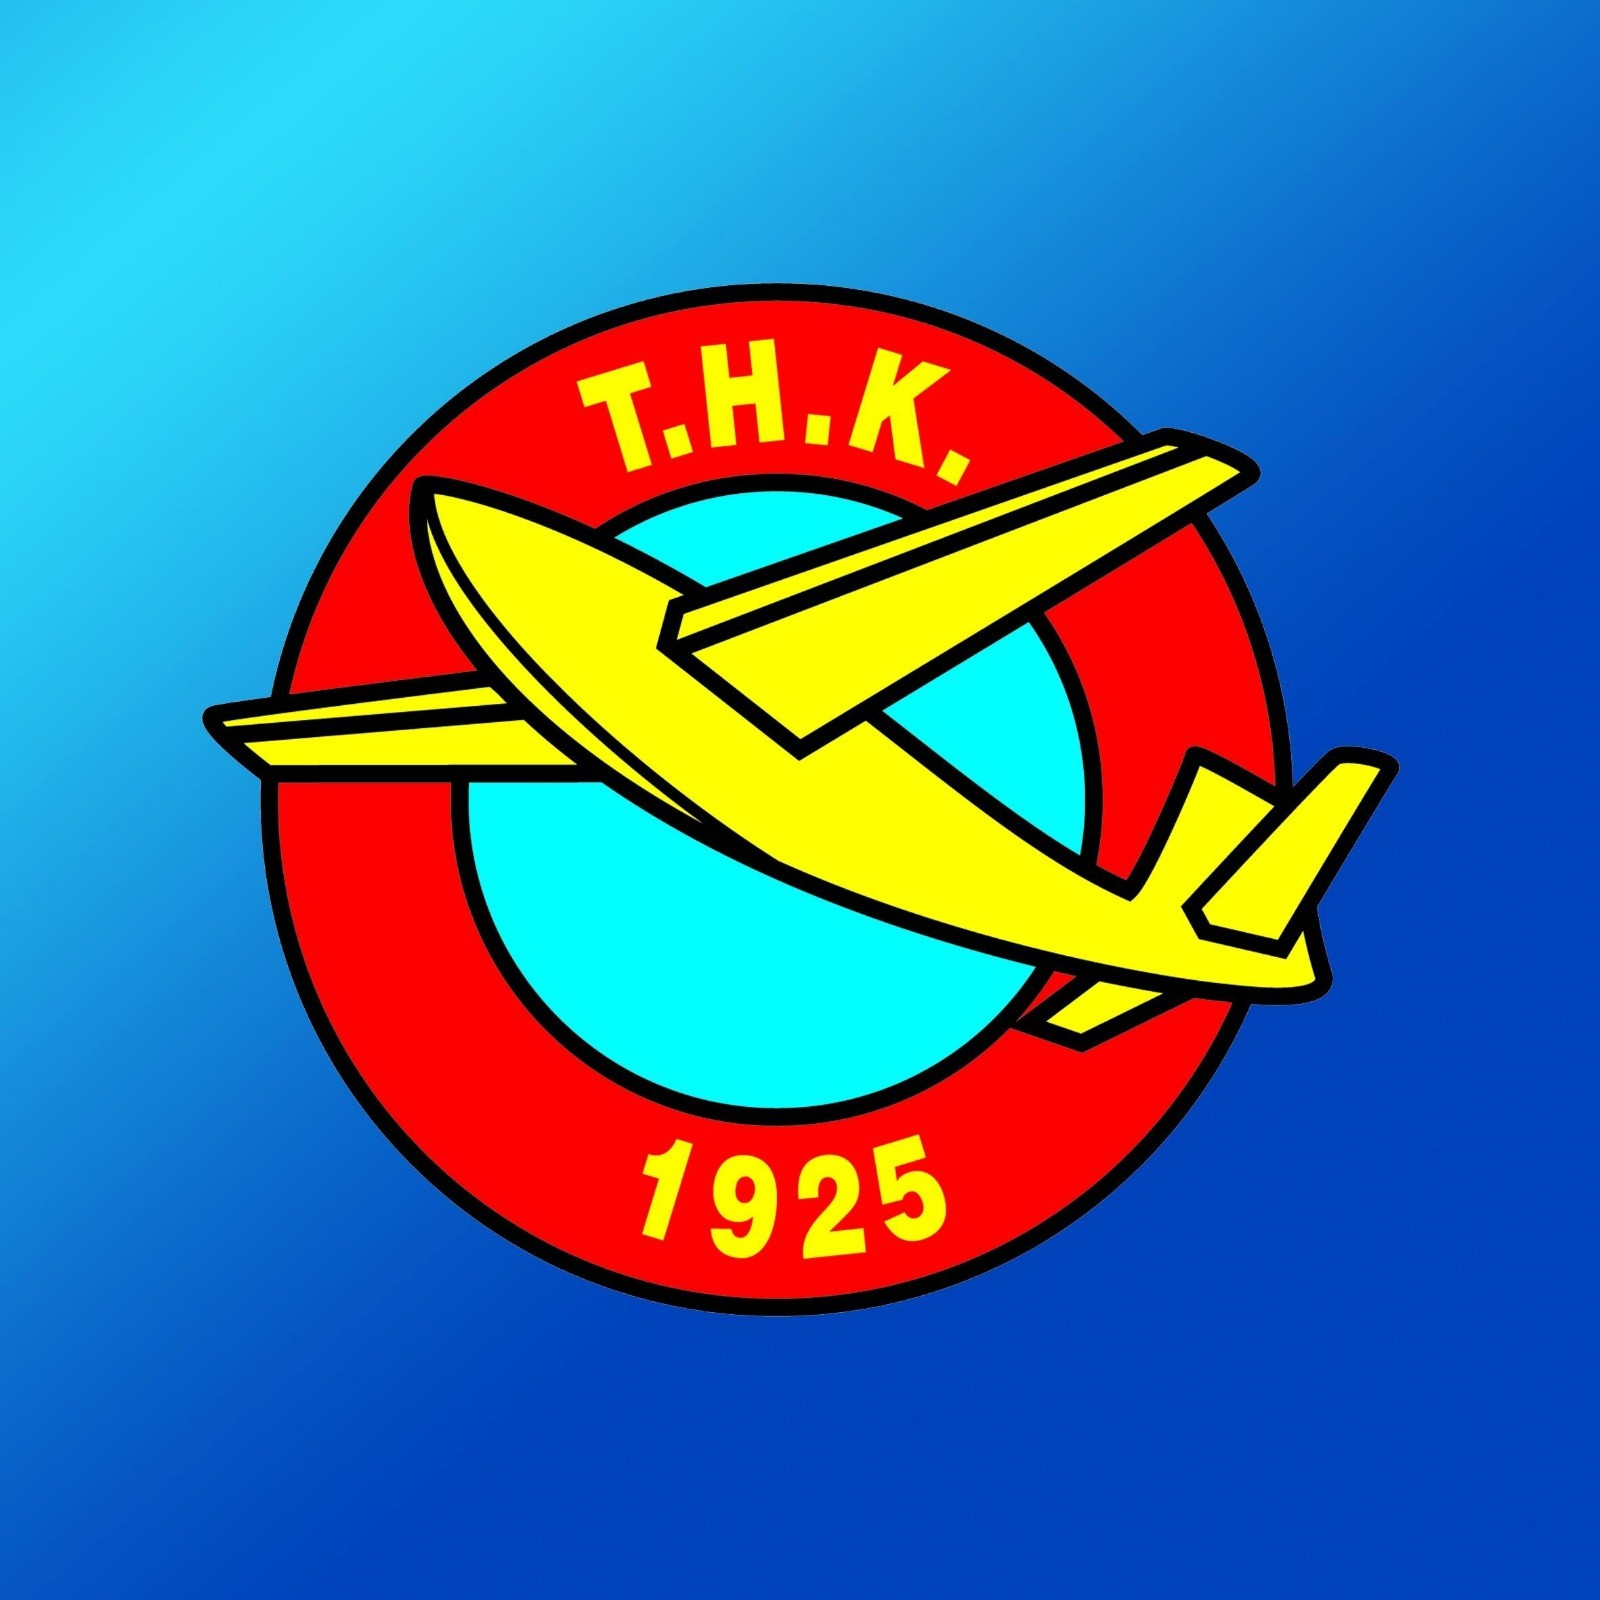 T.H.K